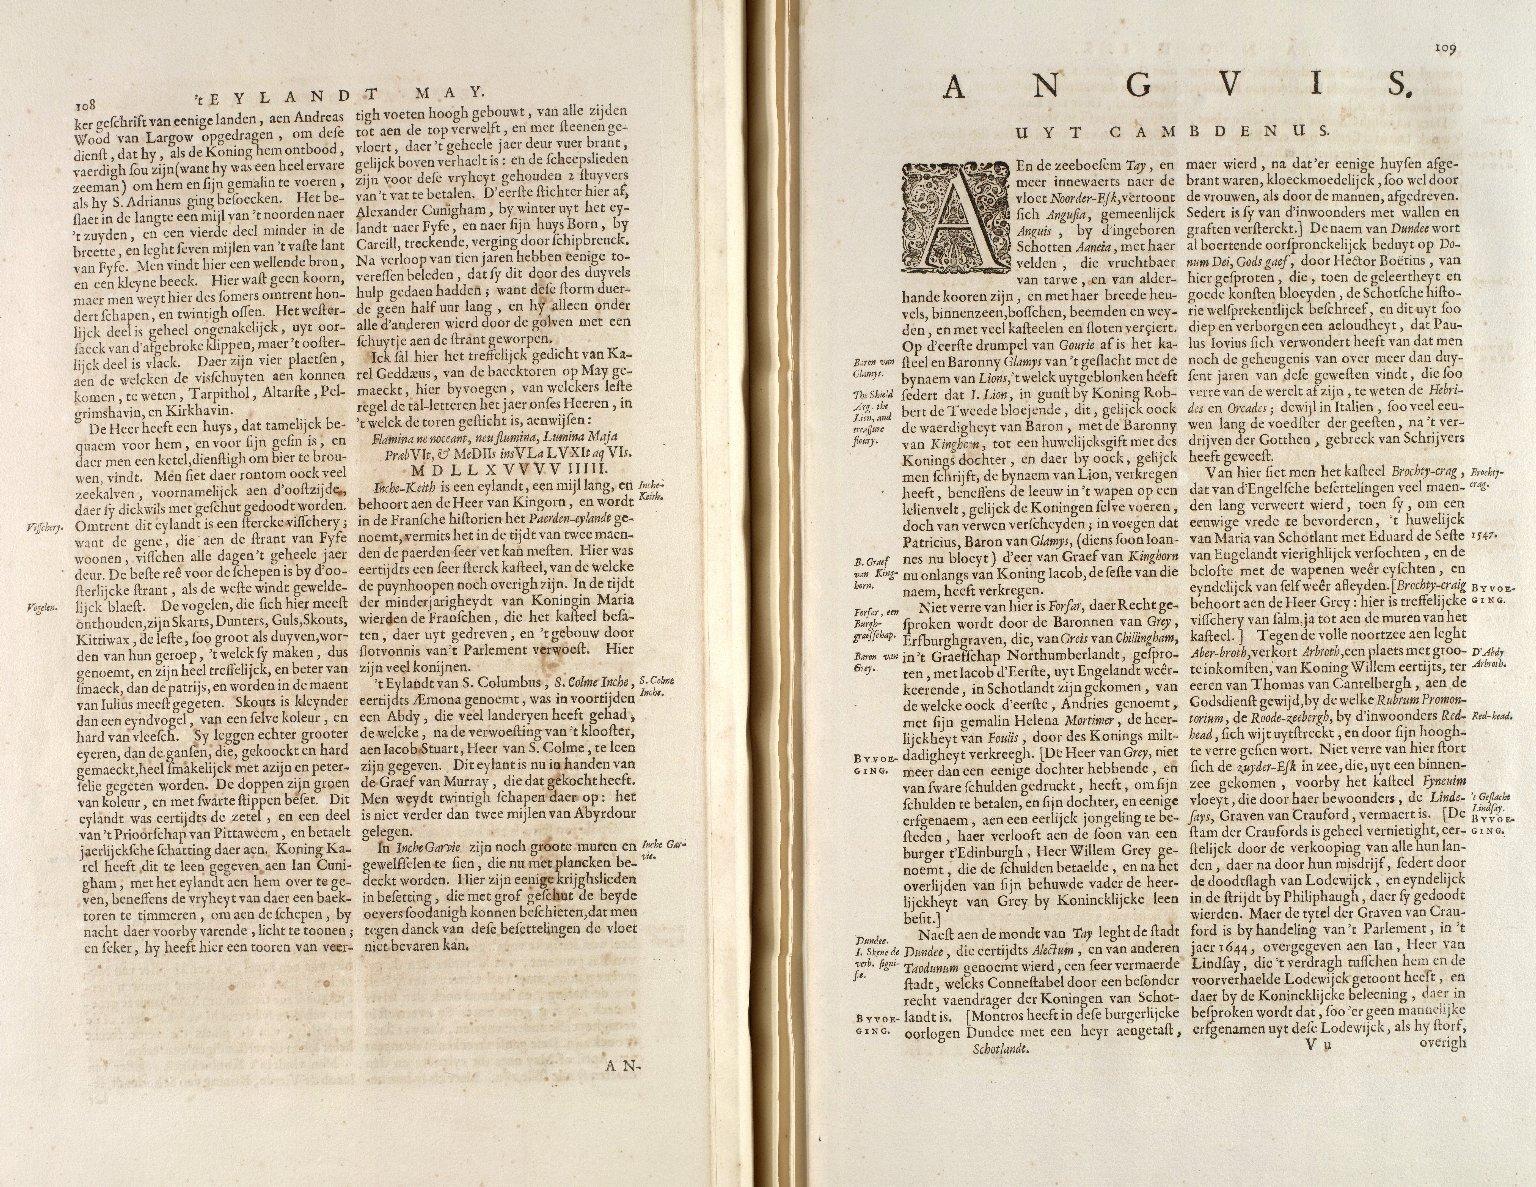 [Geographiae Blavianae] [Also known as: Atlas major] [095 of 153]